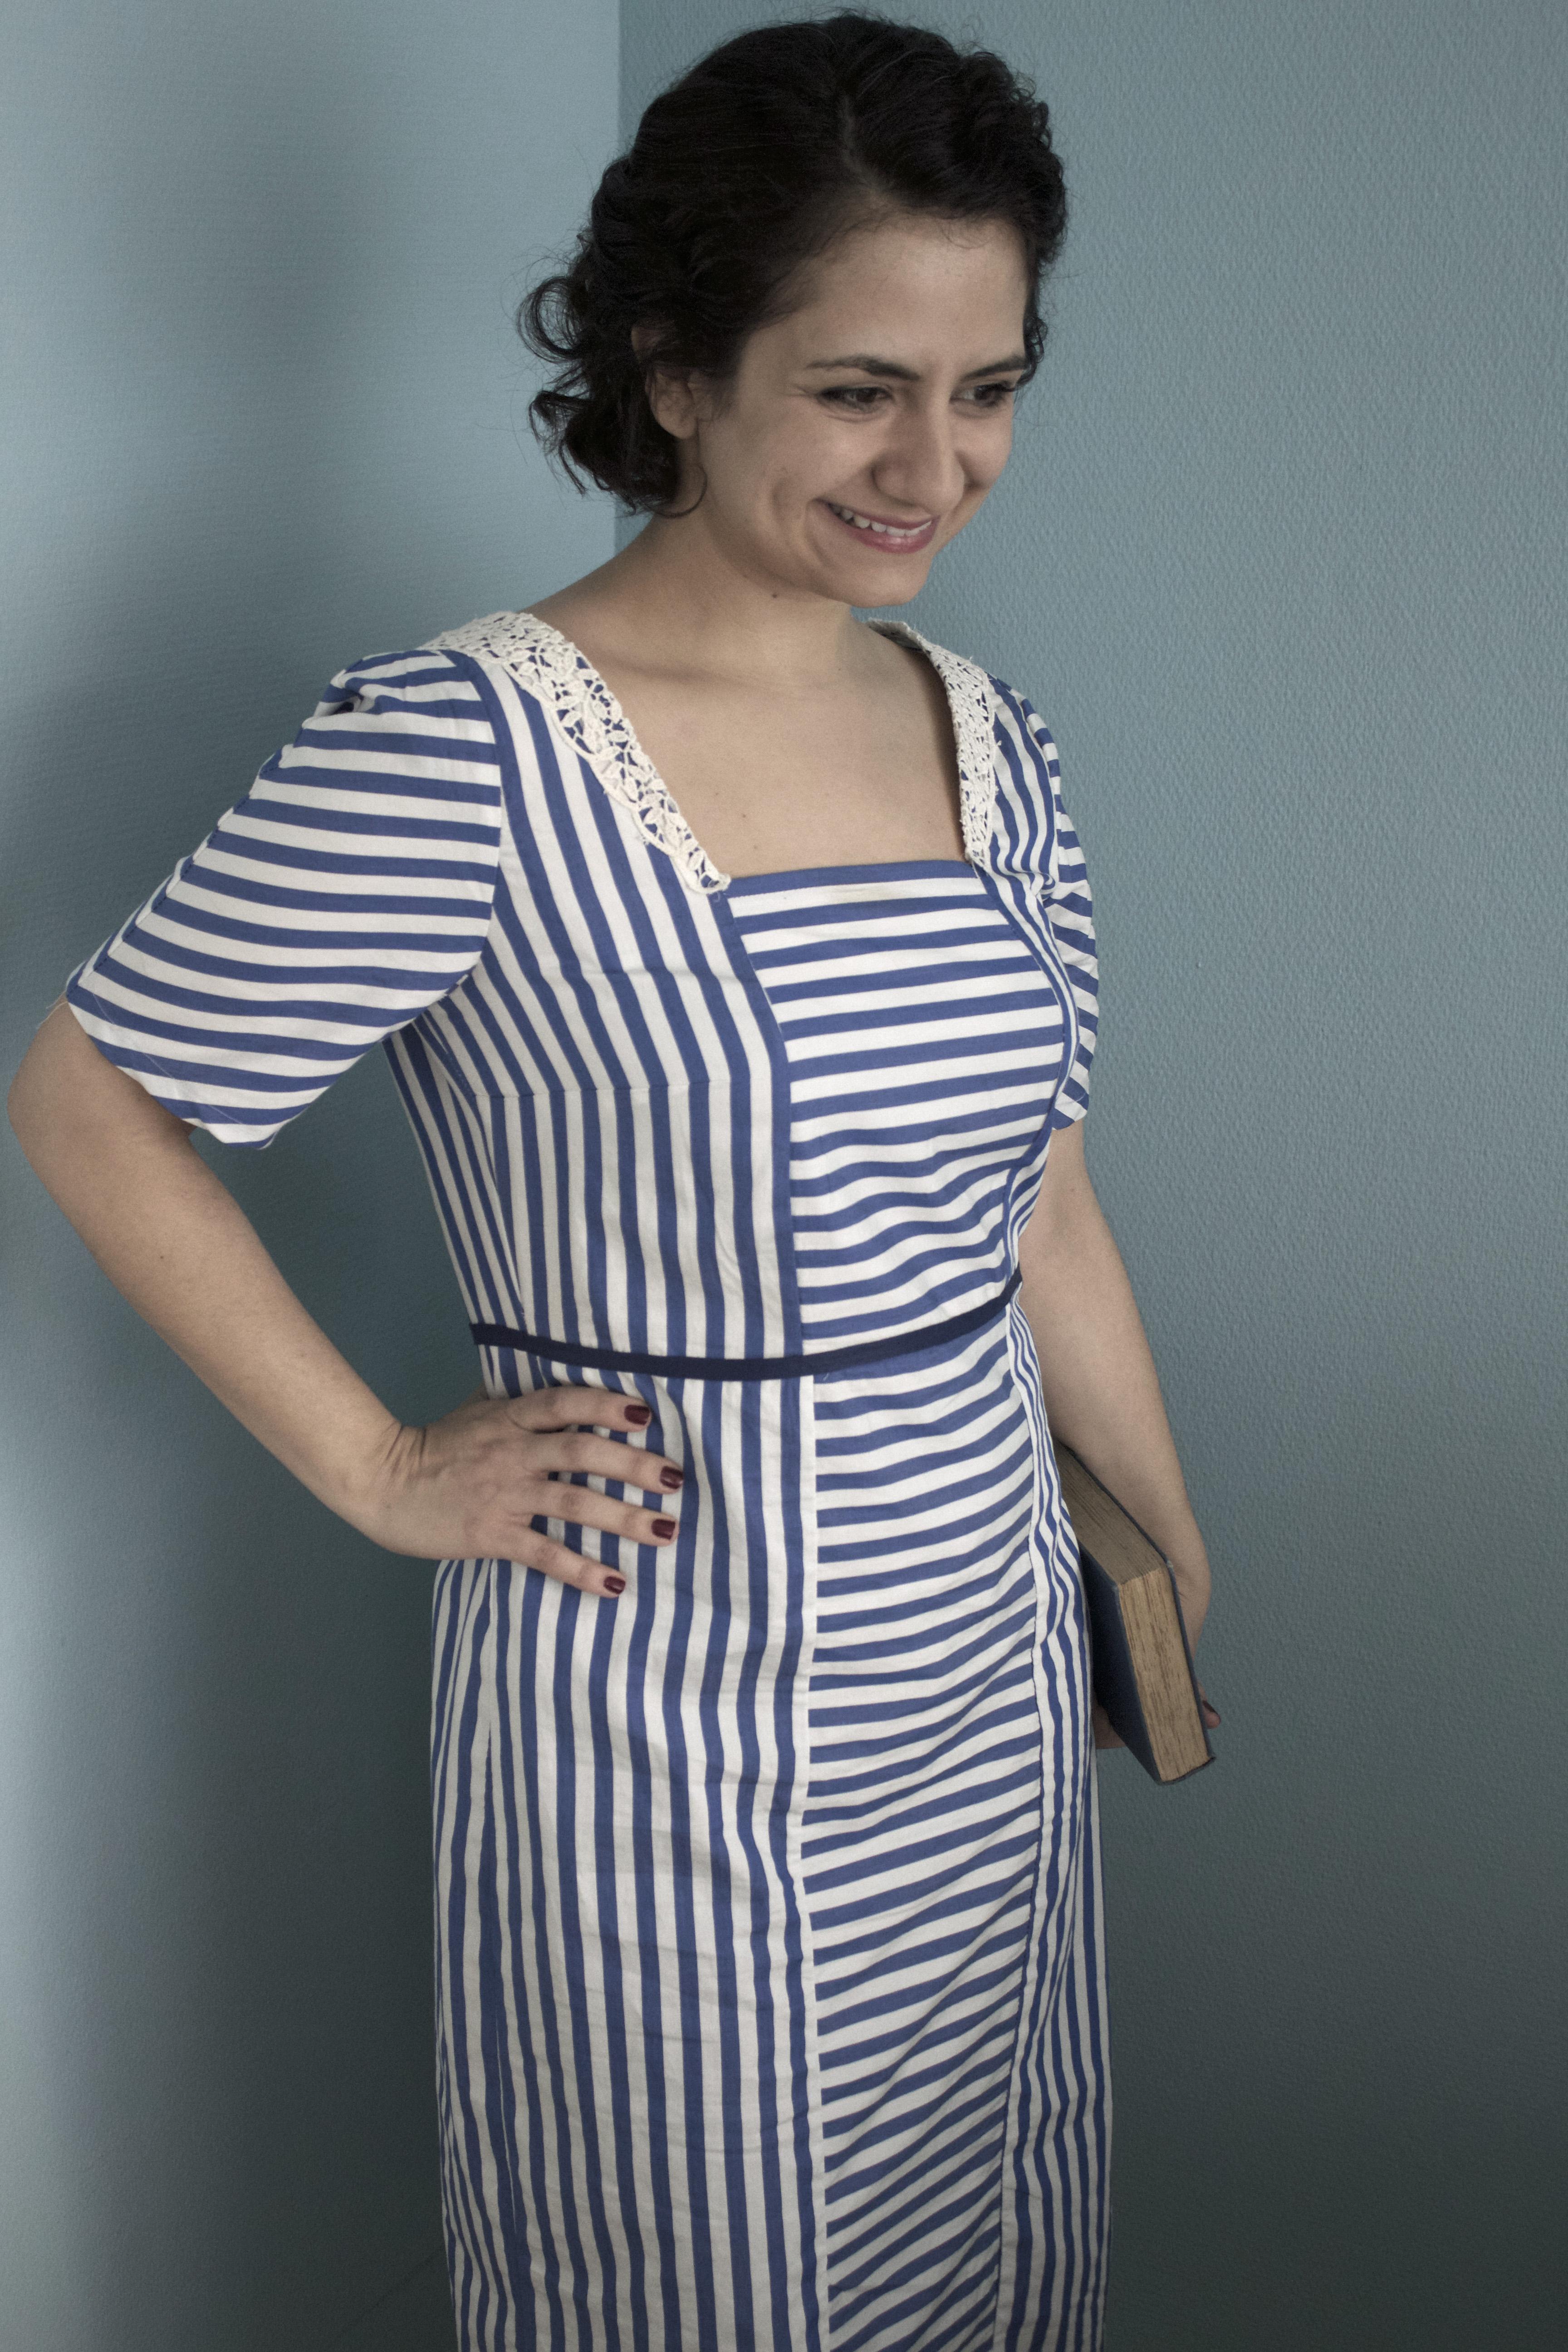 Handmade Liebling des Monats: Mein Lady Mary Dress